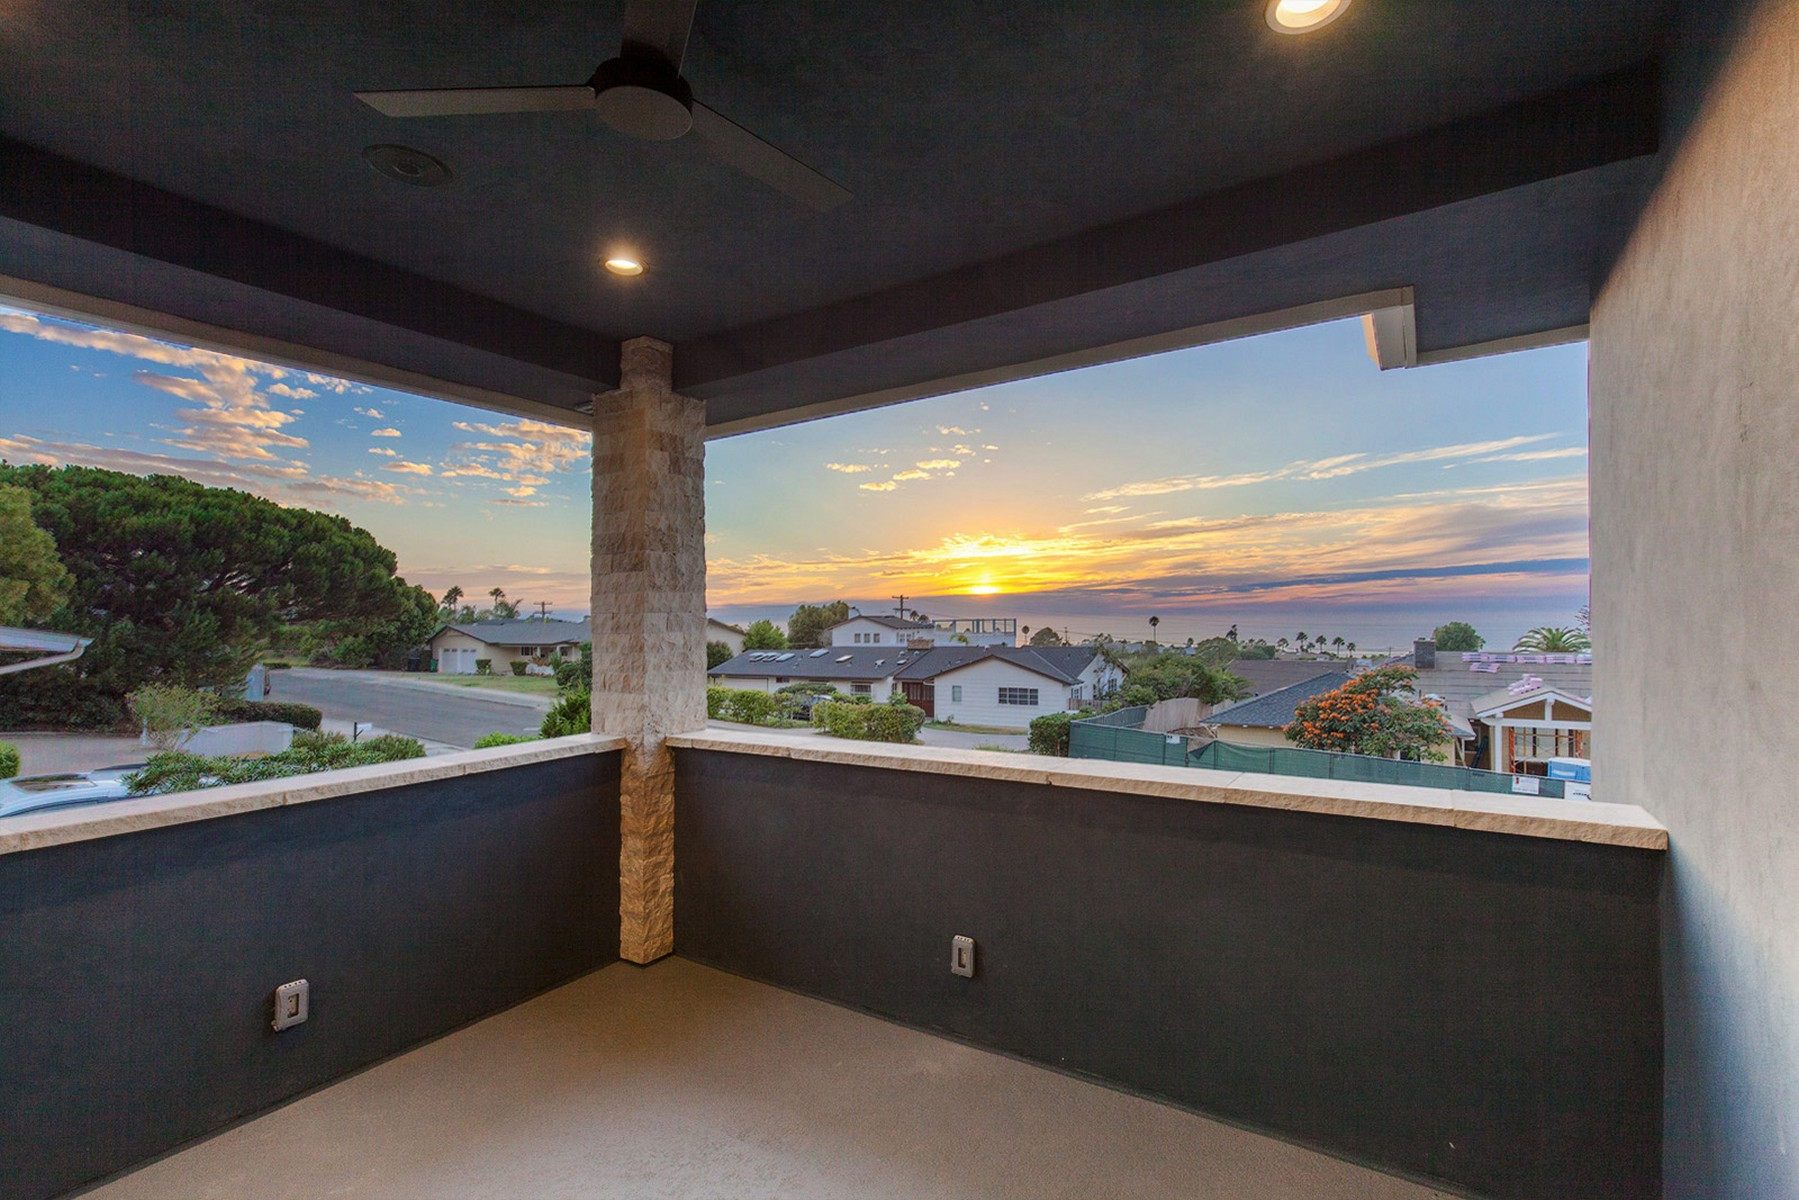 Additional photo for property listing at 6645 Avenida De Las Pescas  La Jolla, California 92037 Estados Unidos